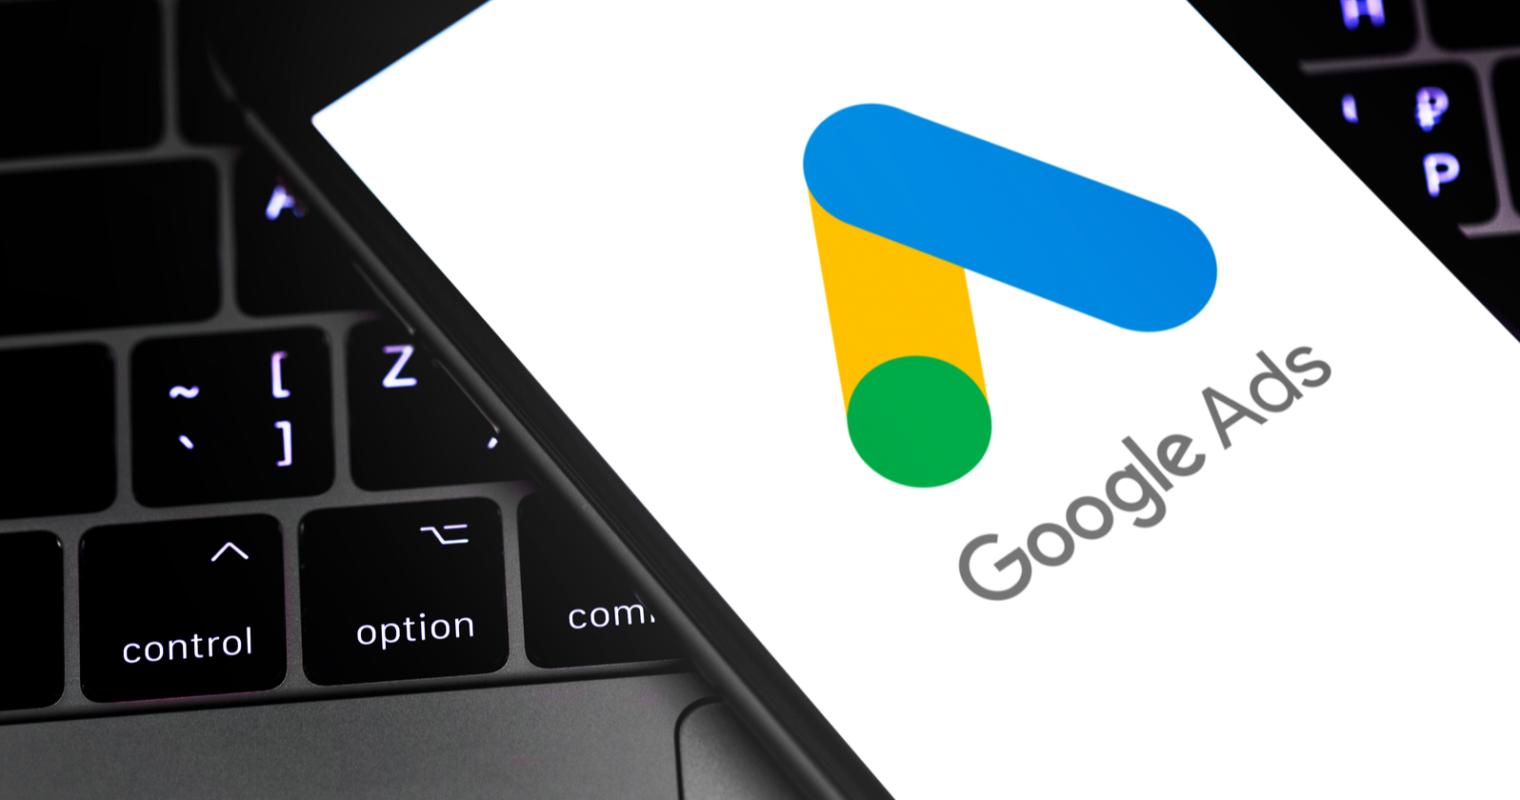 mobile phone displaying Google ads on a keyboard